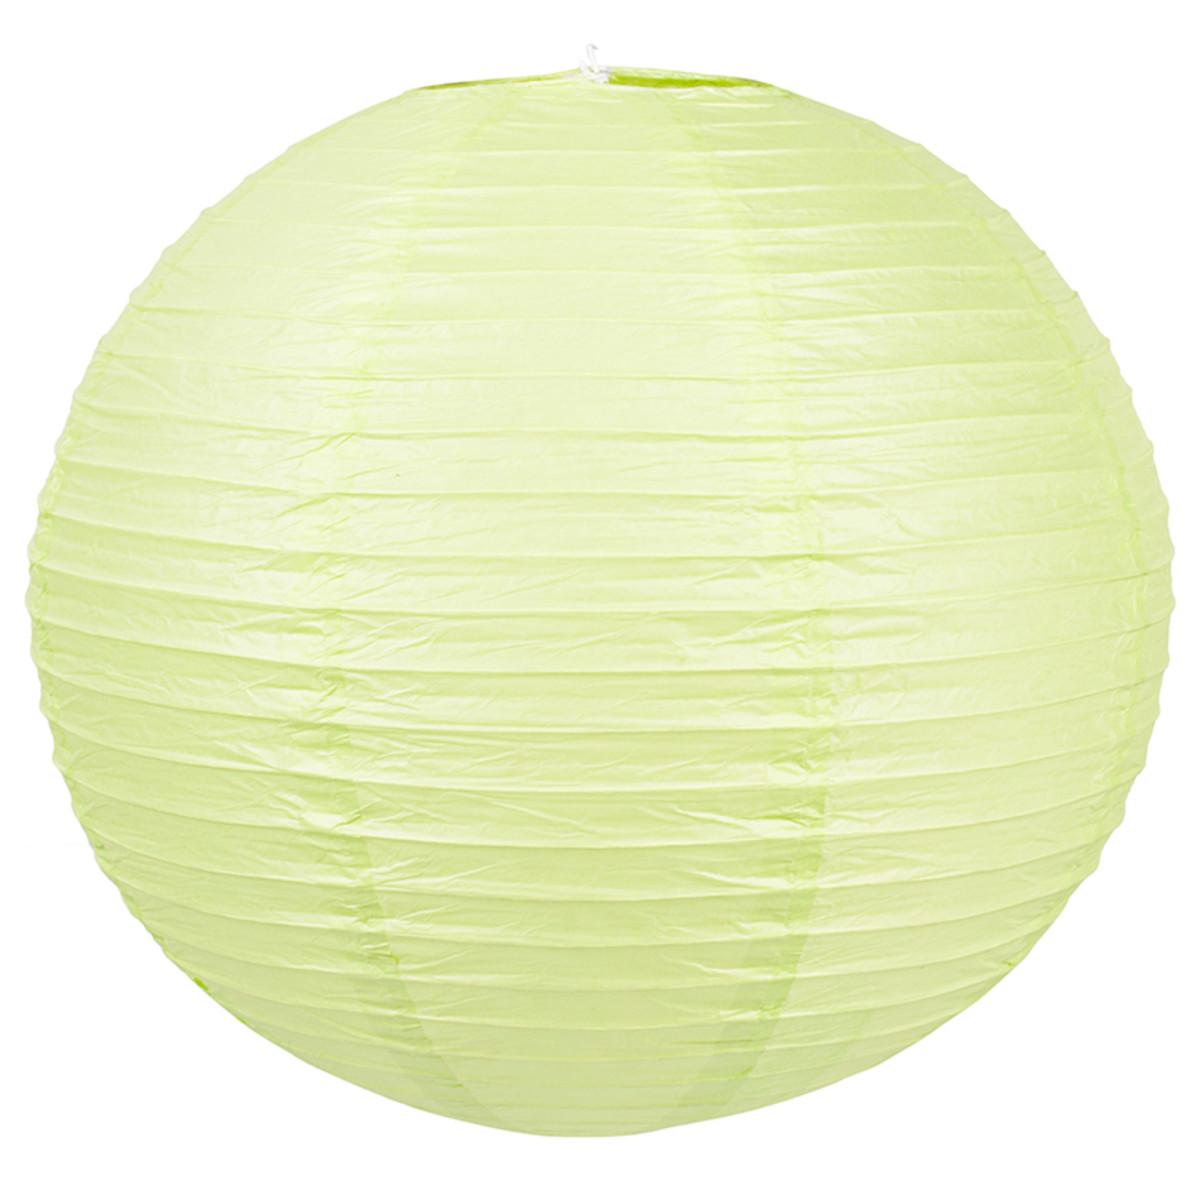 Абажур Baoji 40 см бумага цвет зелёный металлик